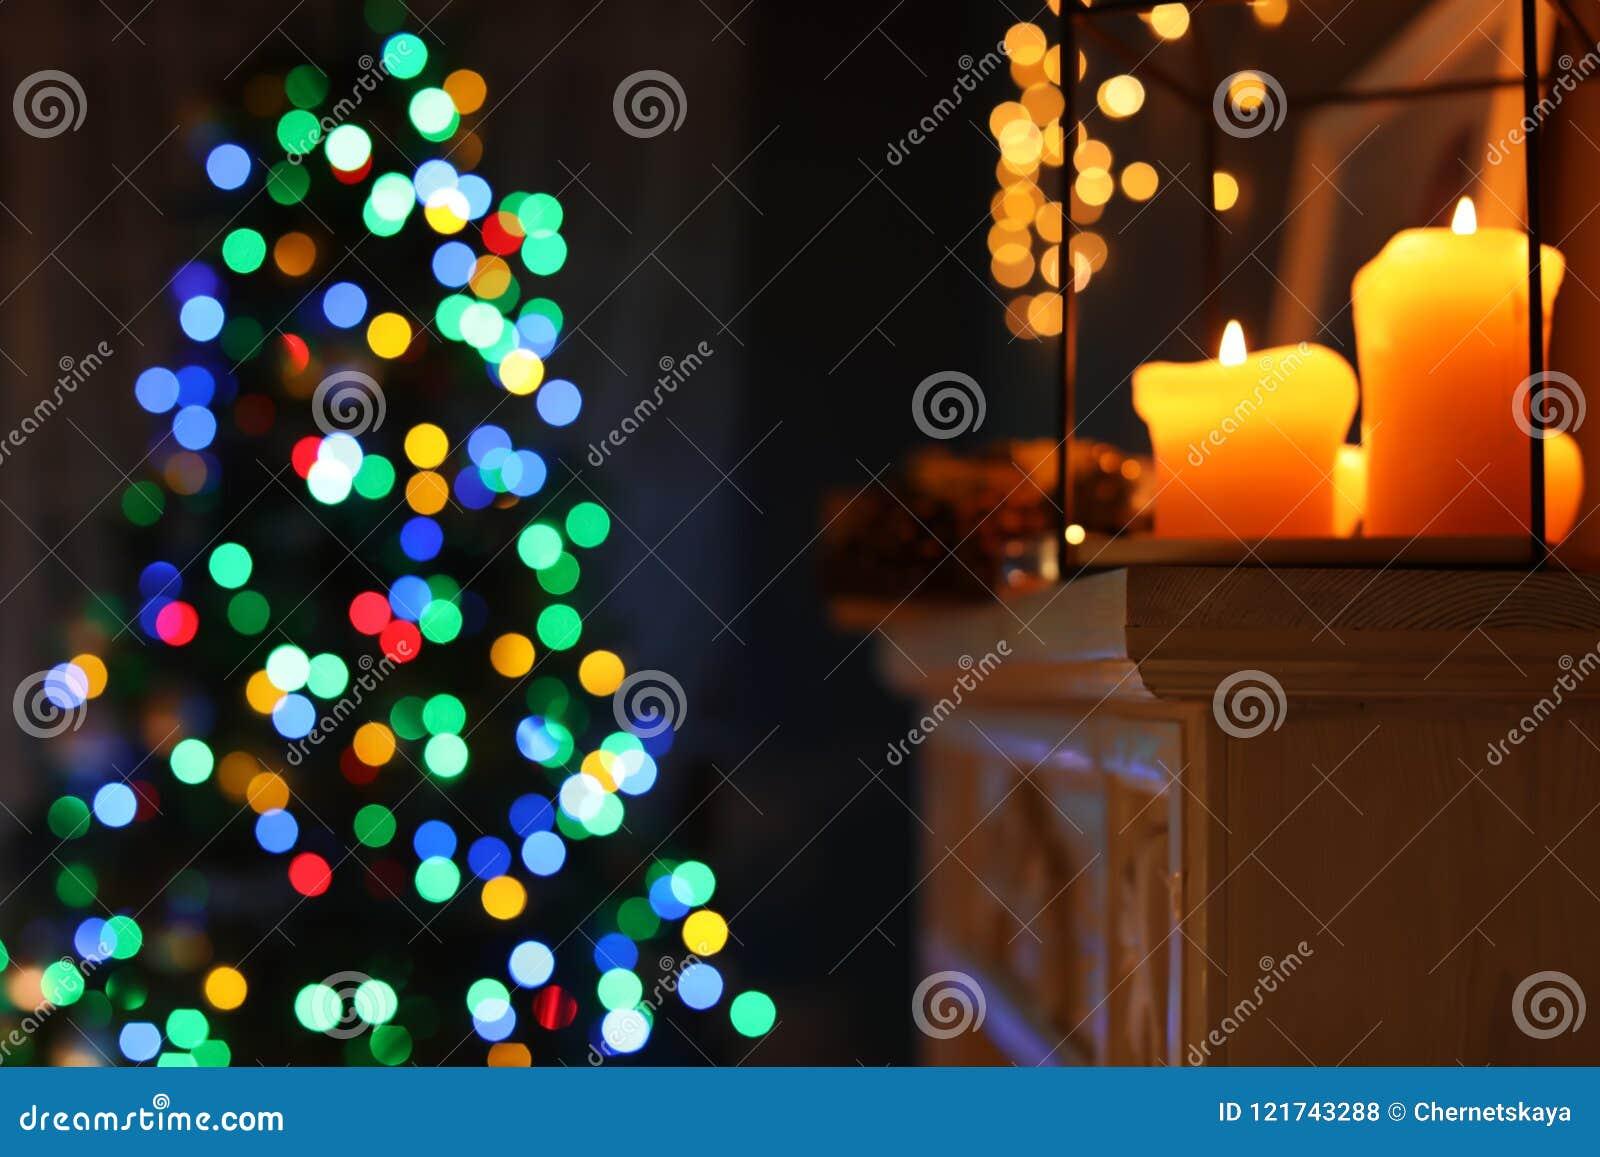 Burning Christmas Tree.Burning Candles On Fireplace And Christmas Tree Stock Photo